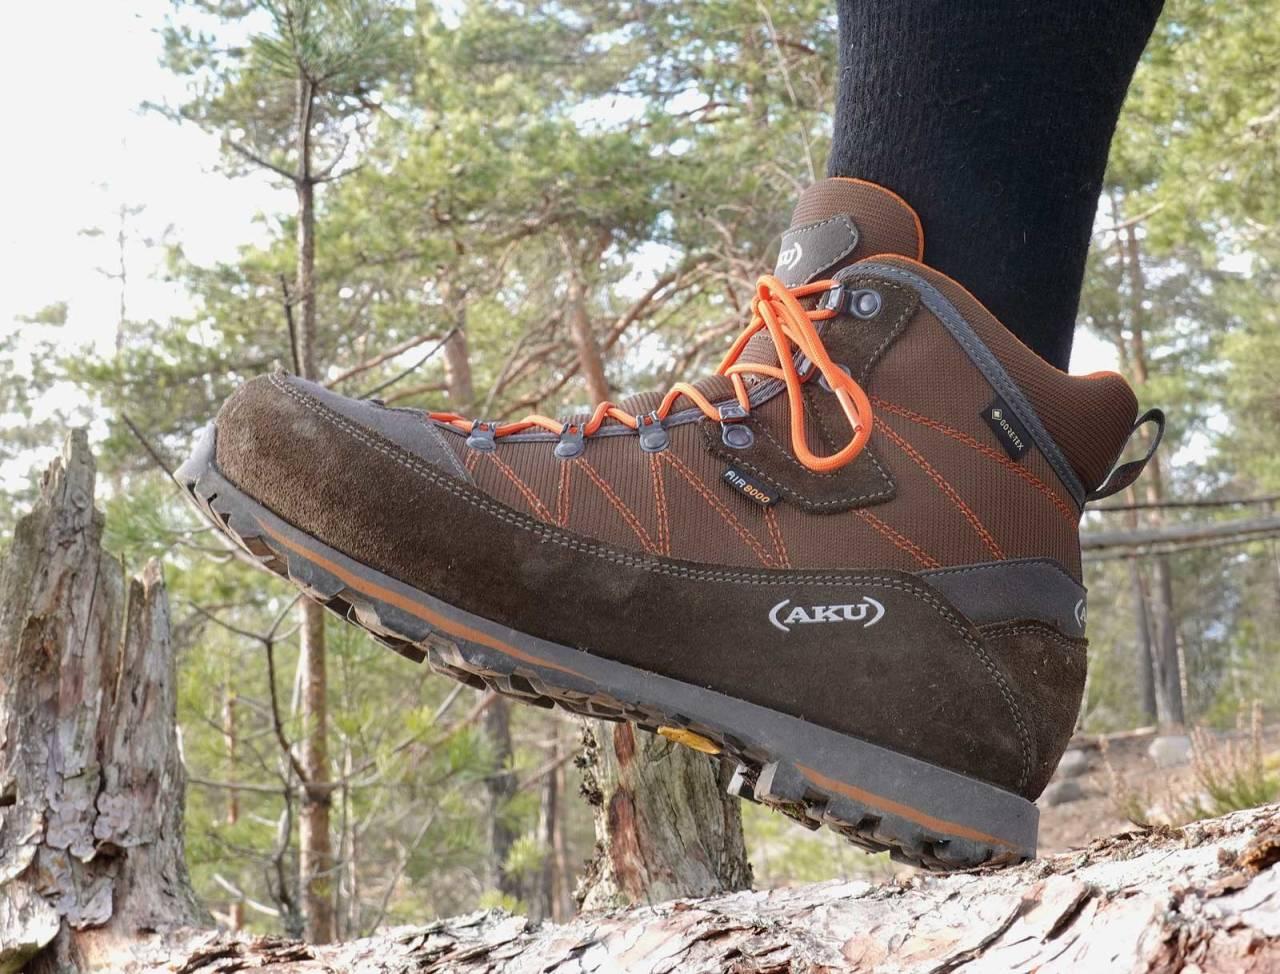 Stødig valg: Aku Tana er meget stødige jaktstøvler, til tross for at de er lette og halvhøye.